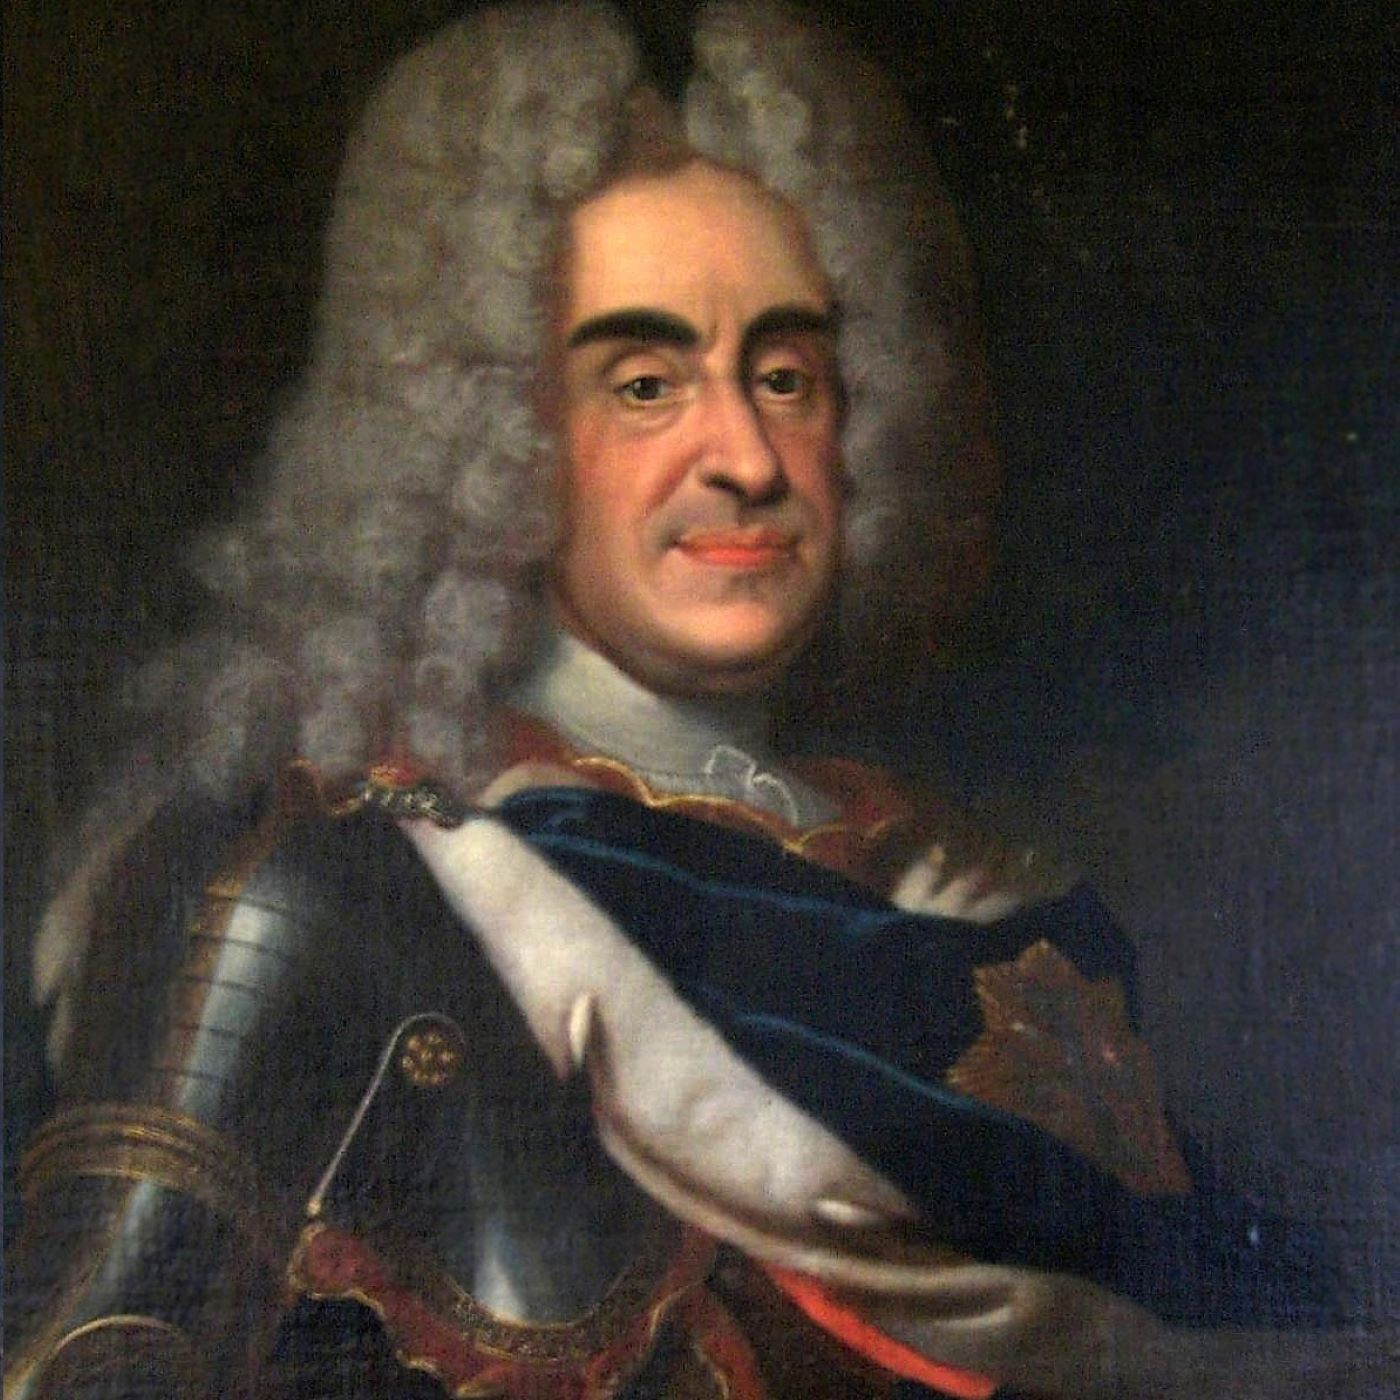 GEU-P003: Der Entthronungskrieg gegen August den Starken (1701-1706), mit Dr. Dorothée Goetze